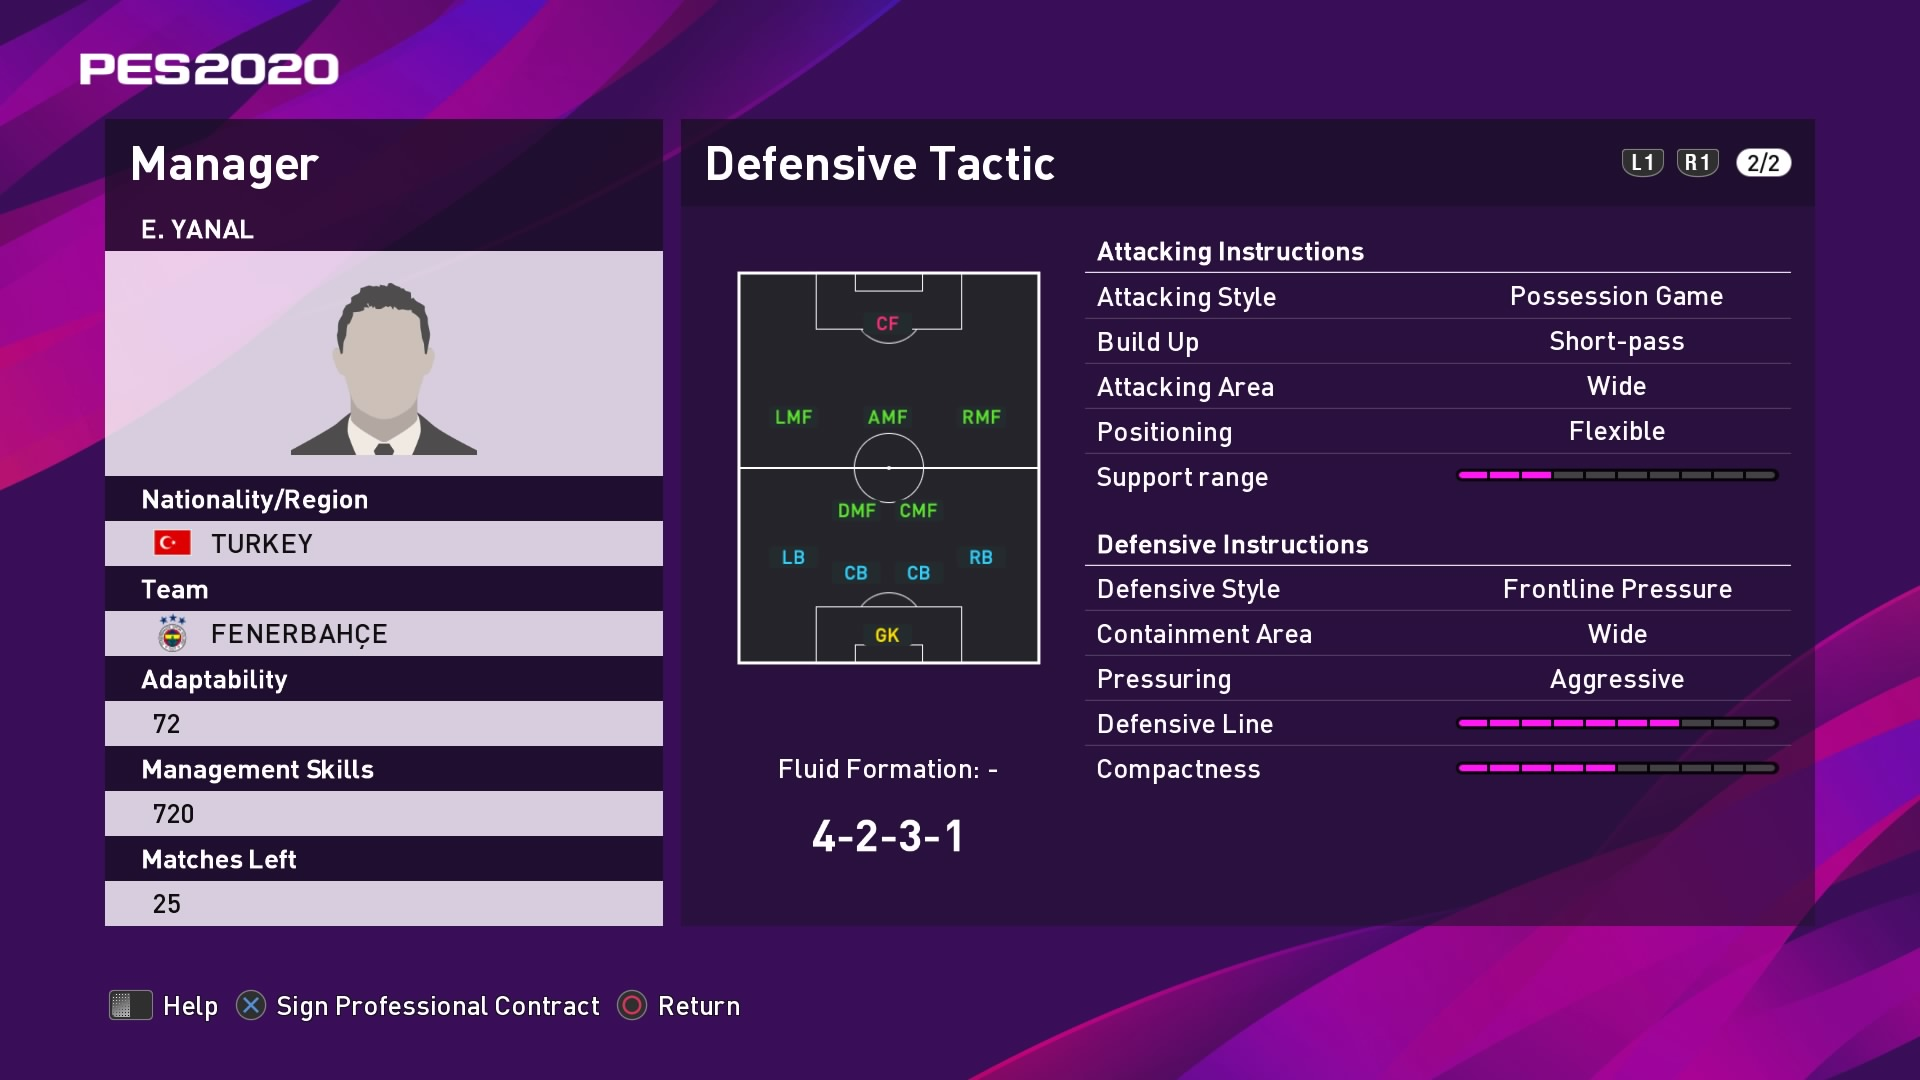 E. Yanal (Ersun Yanal) Defensive Tactic in PES 2020 myClub